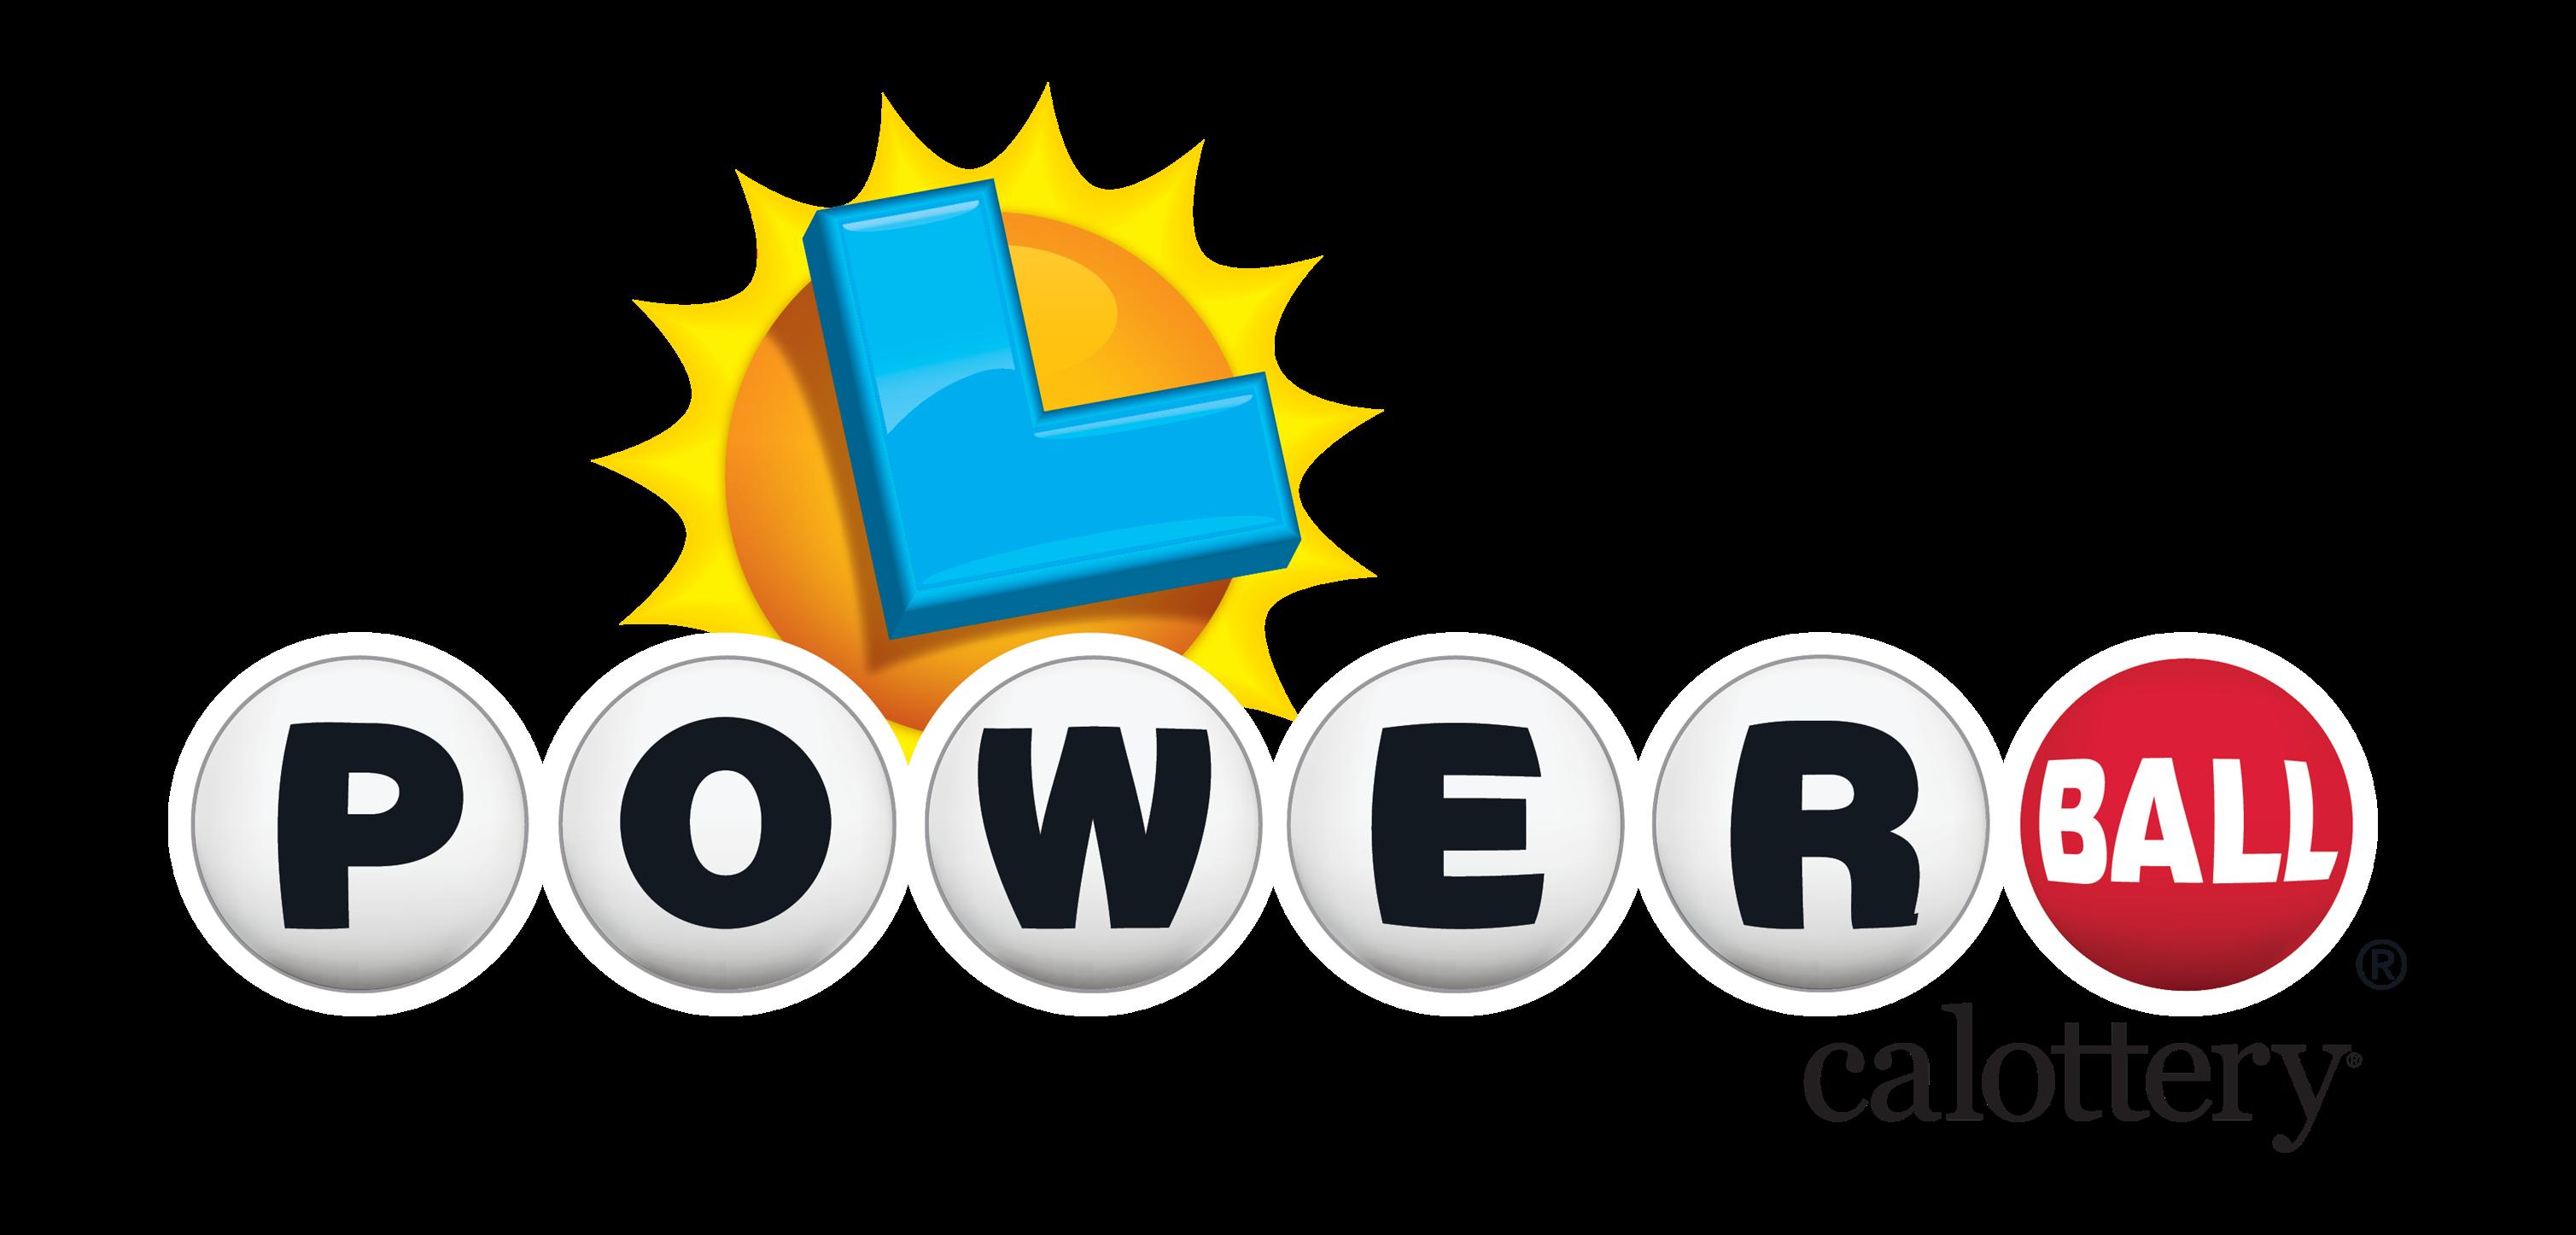 Powerball, calottery